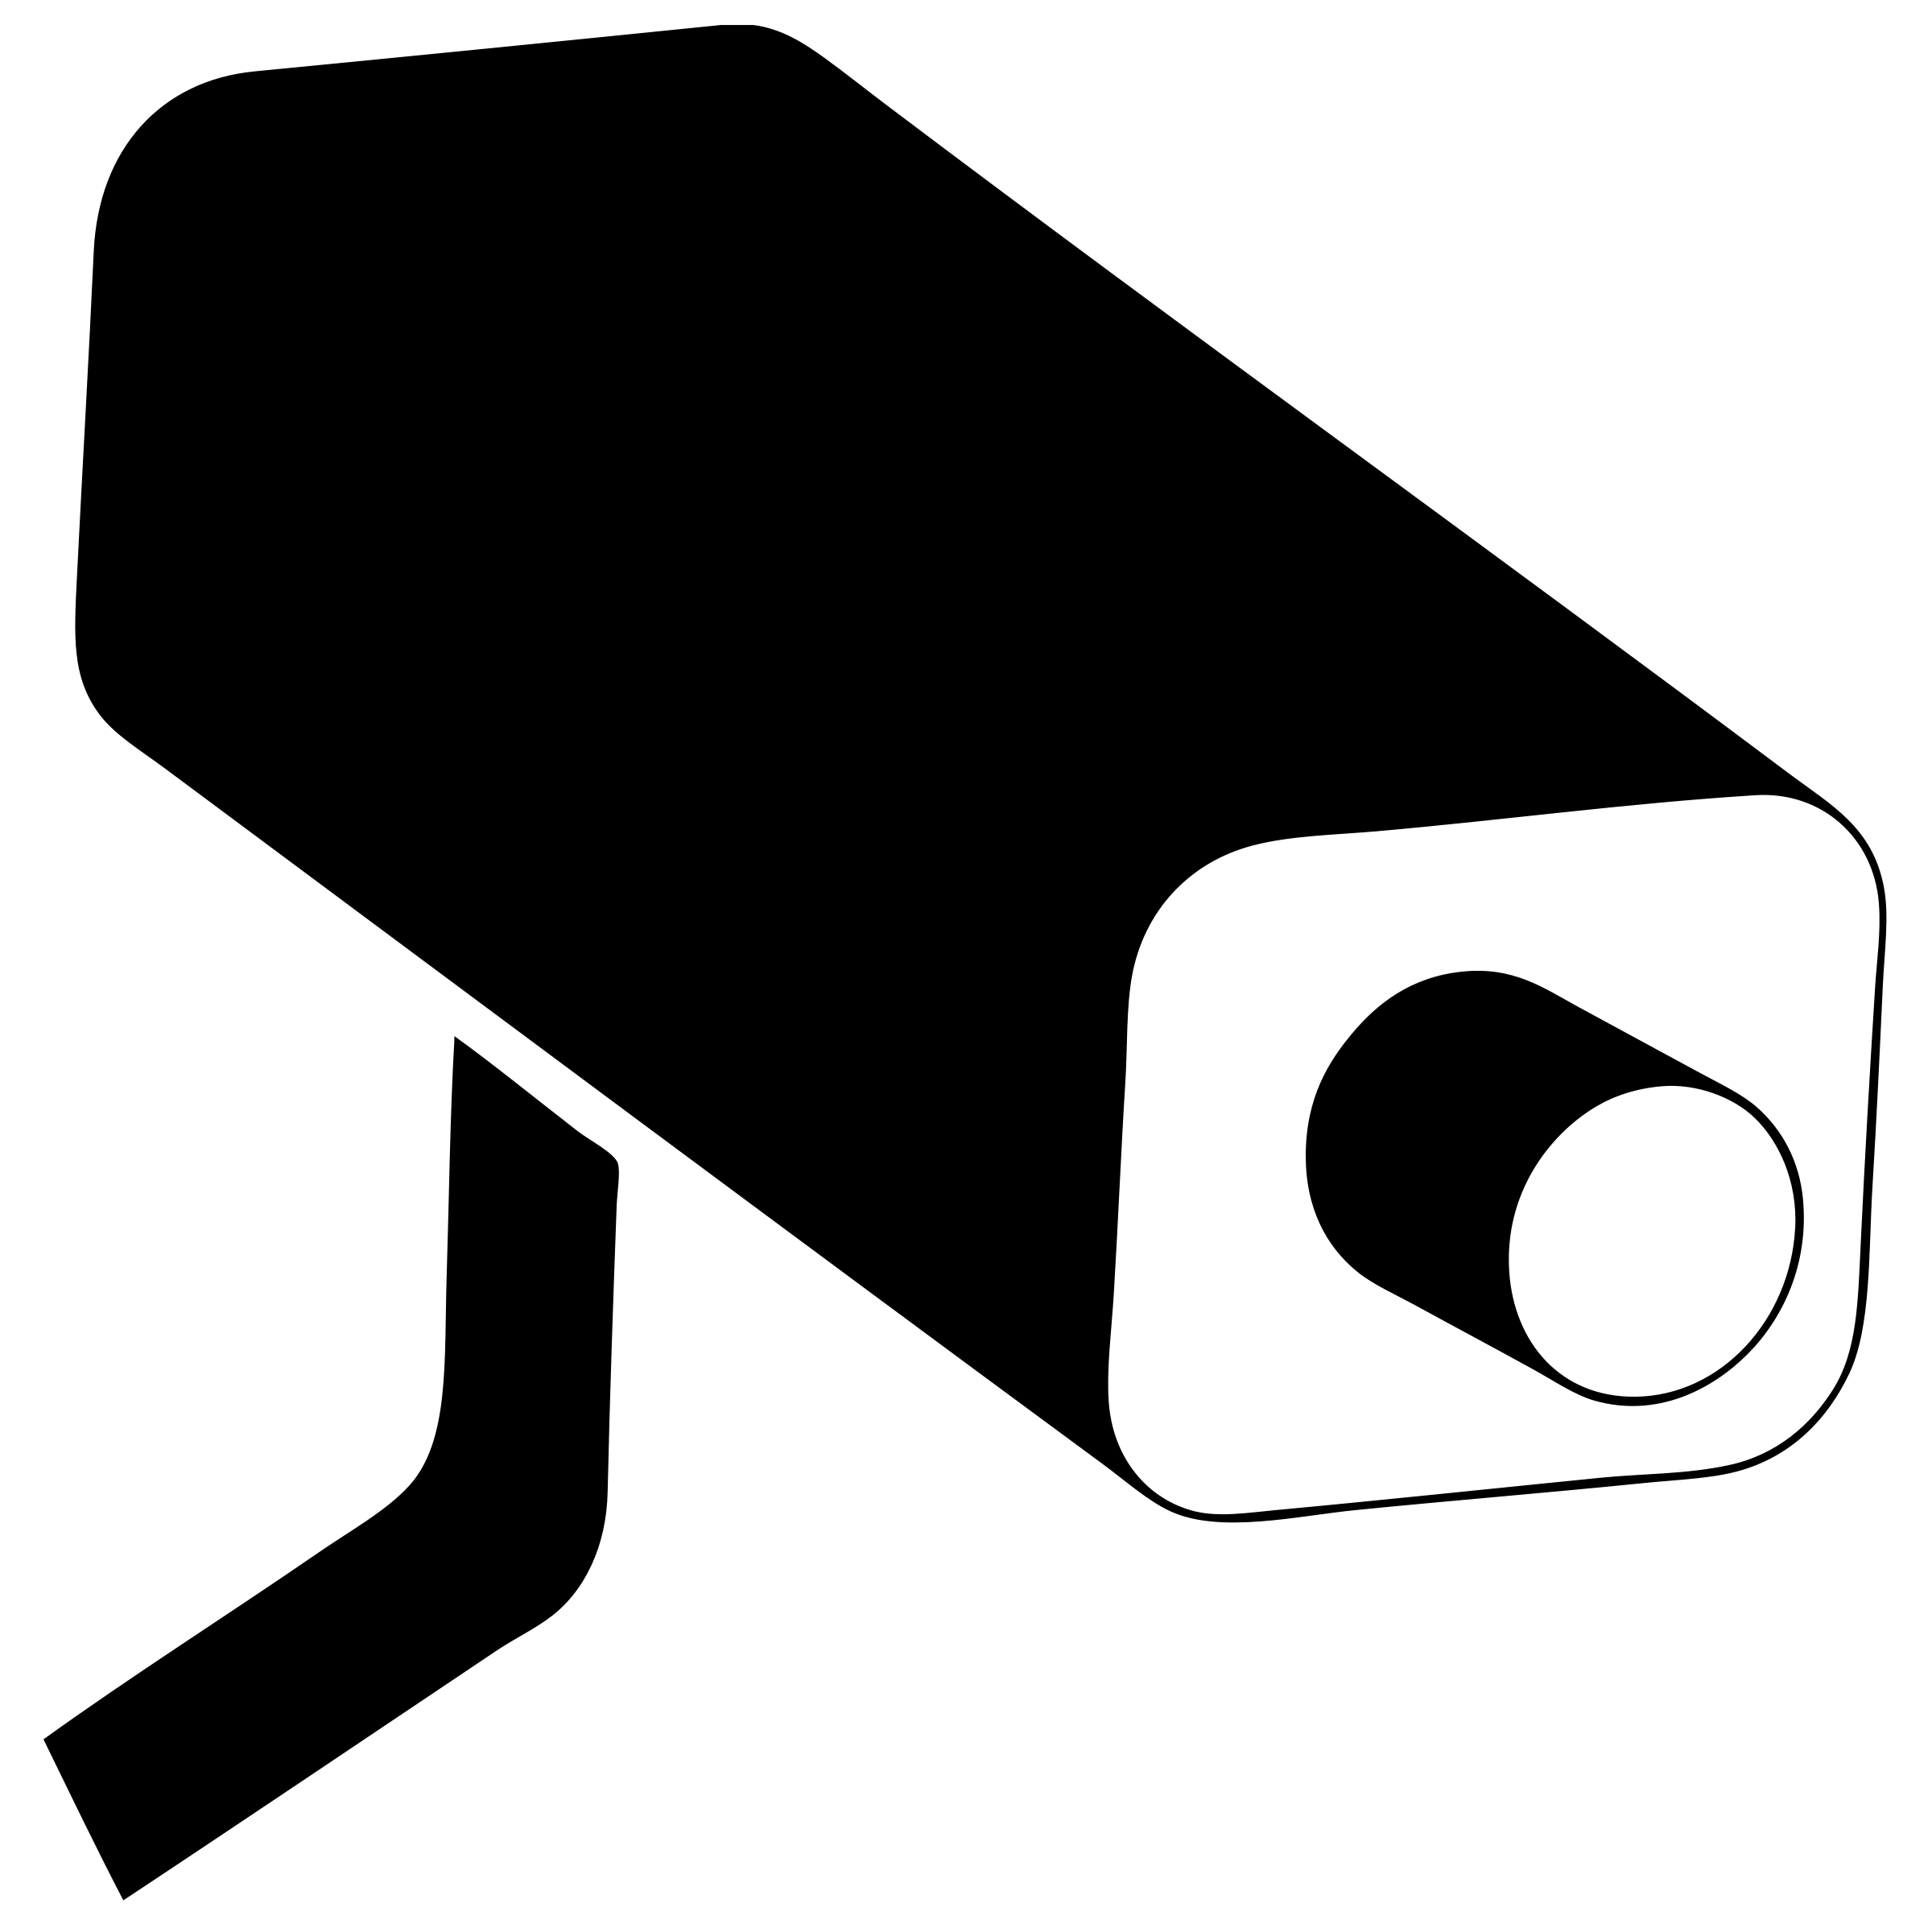 Cctv camera icons clipart.